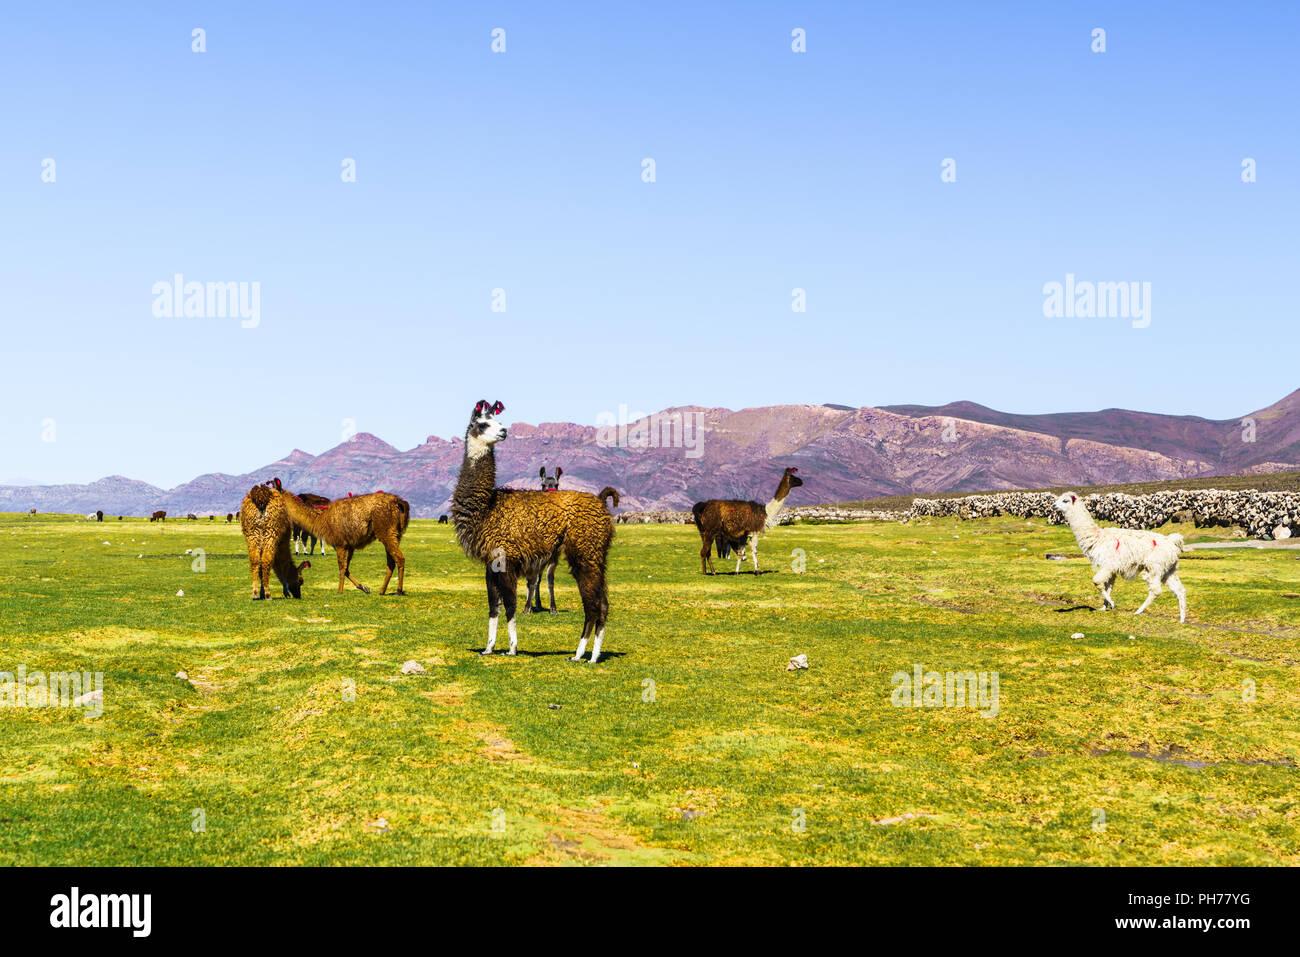 Flock of Llamas grazing at Coqueza Village - Stock Image